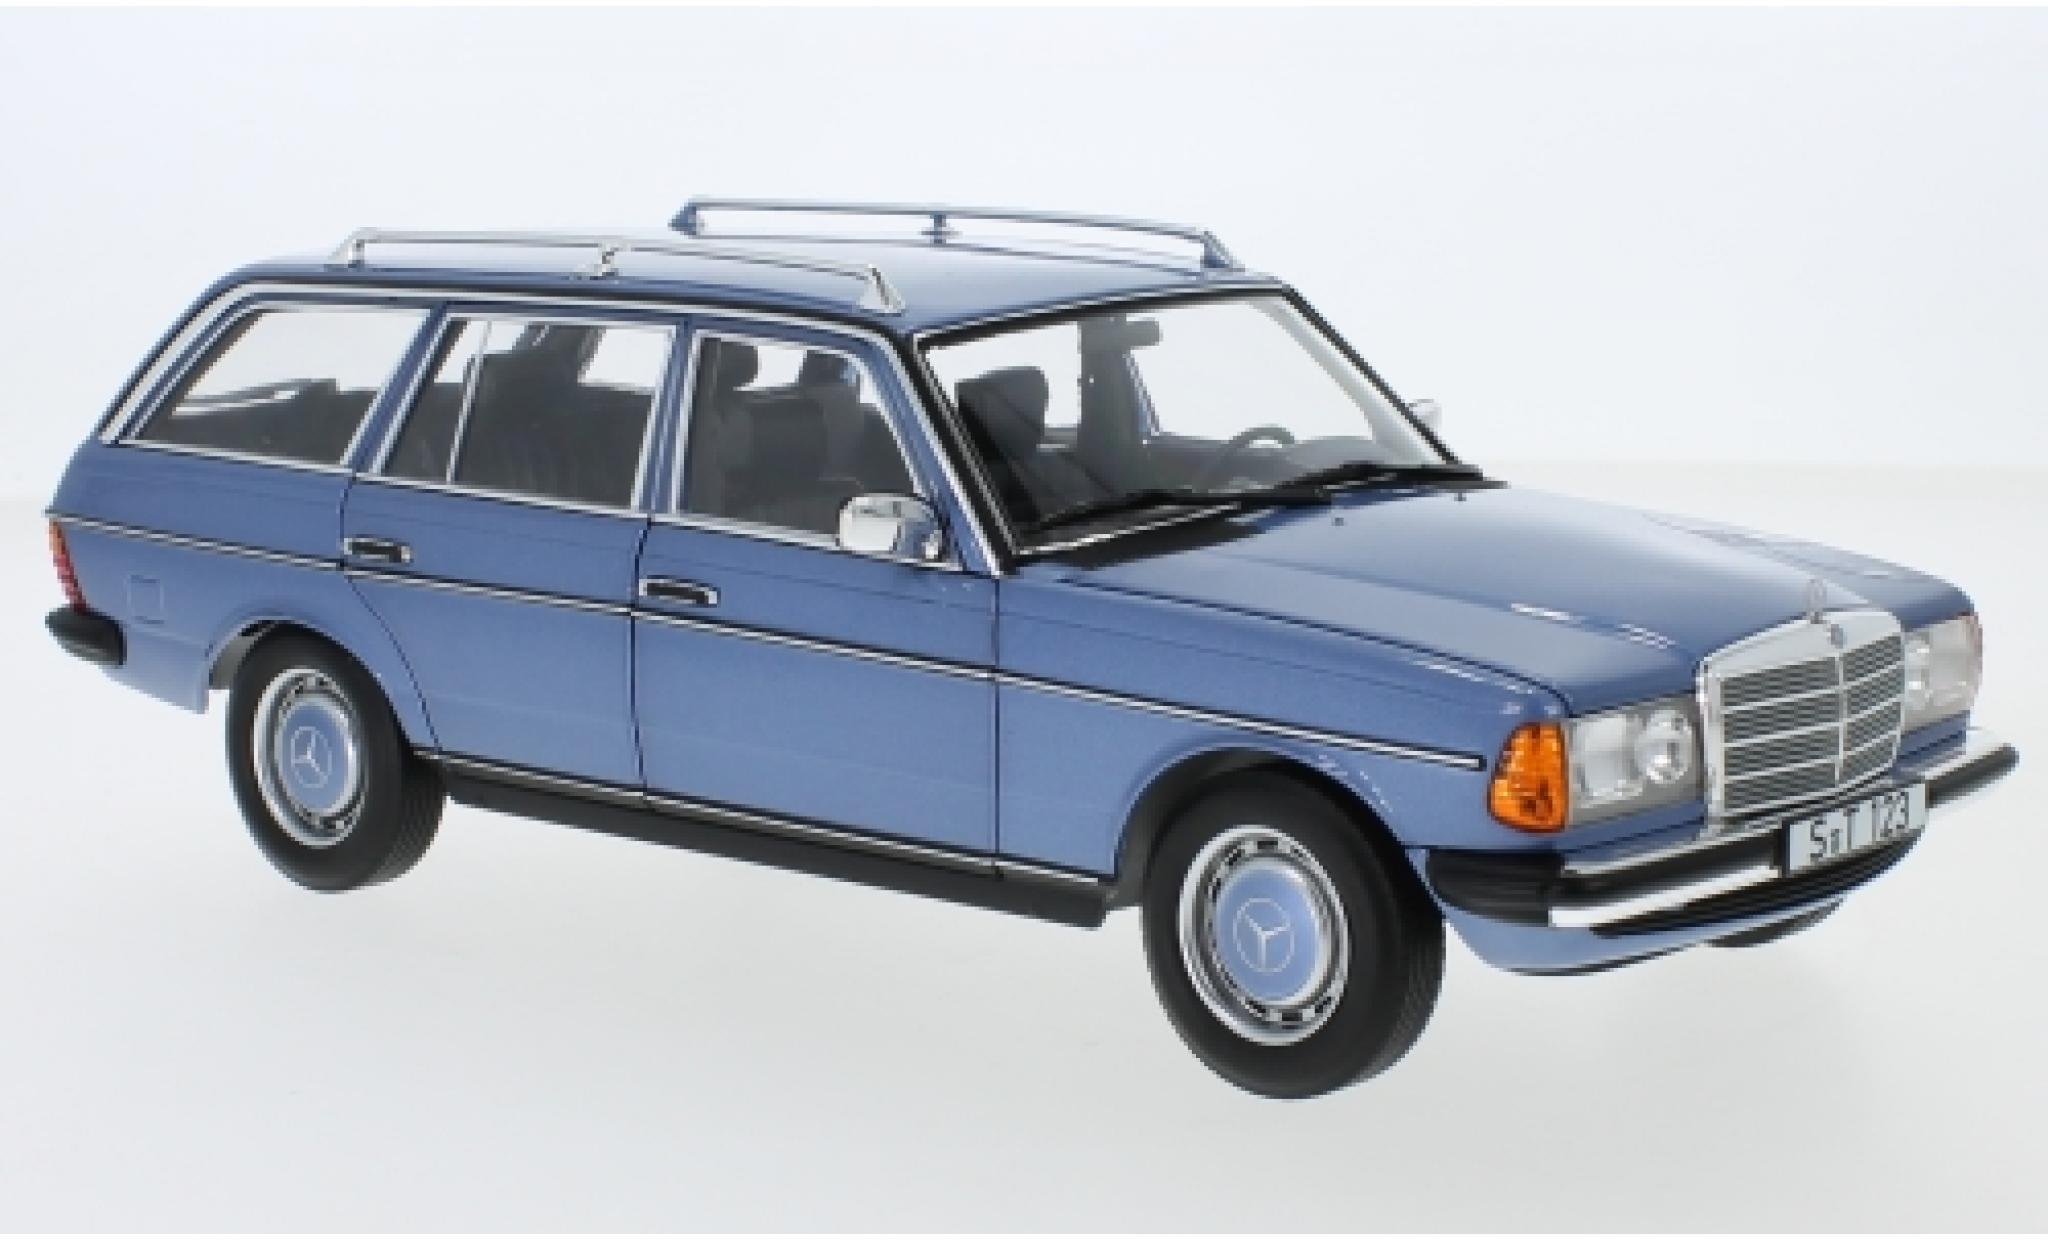 Mercedes 200 1/18 I Norev T (S123) metallise blue 1980